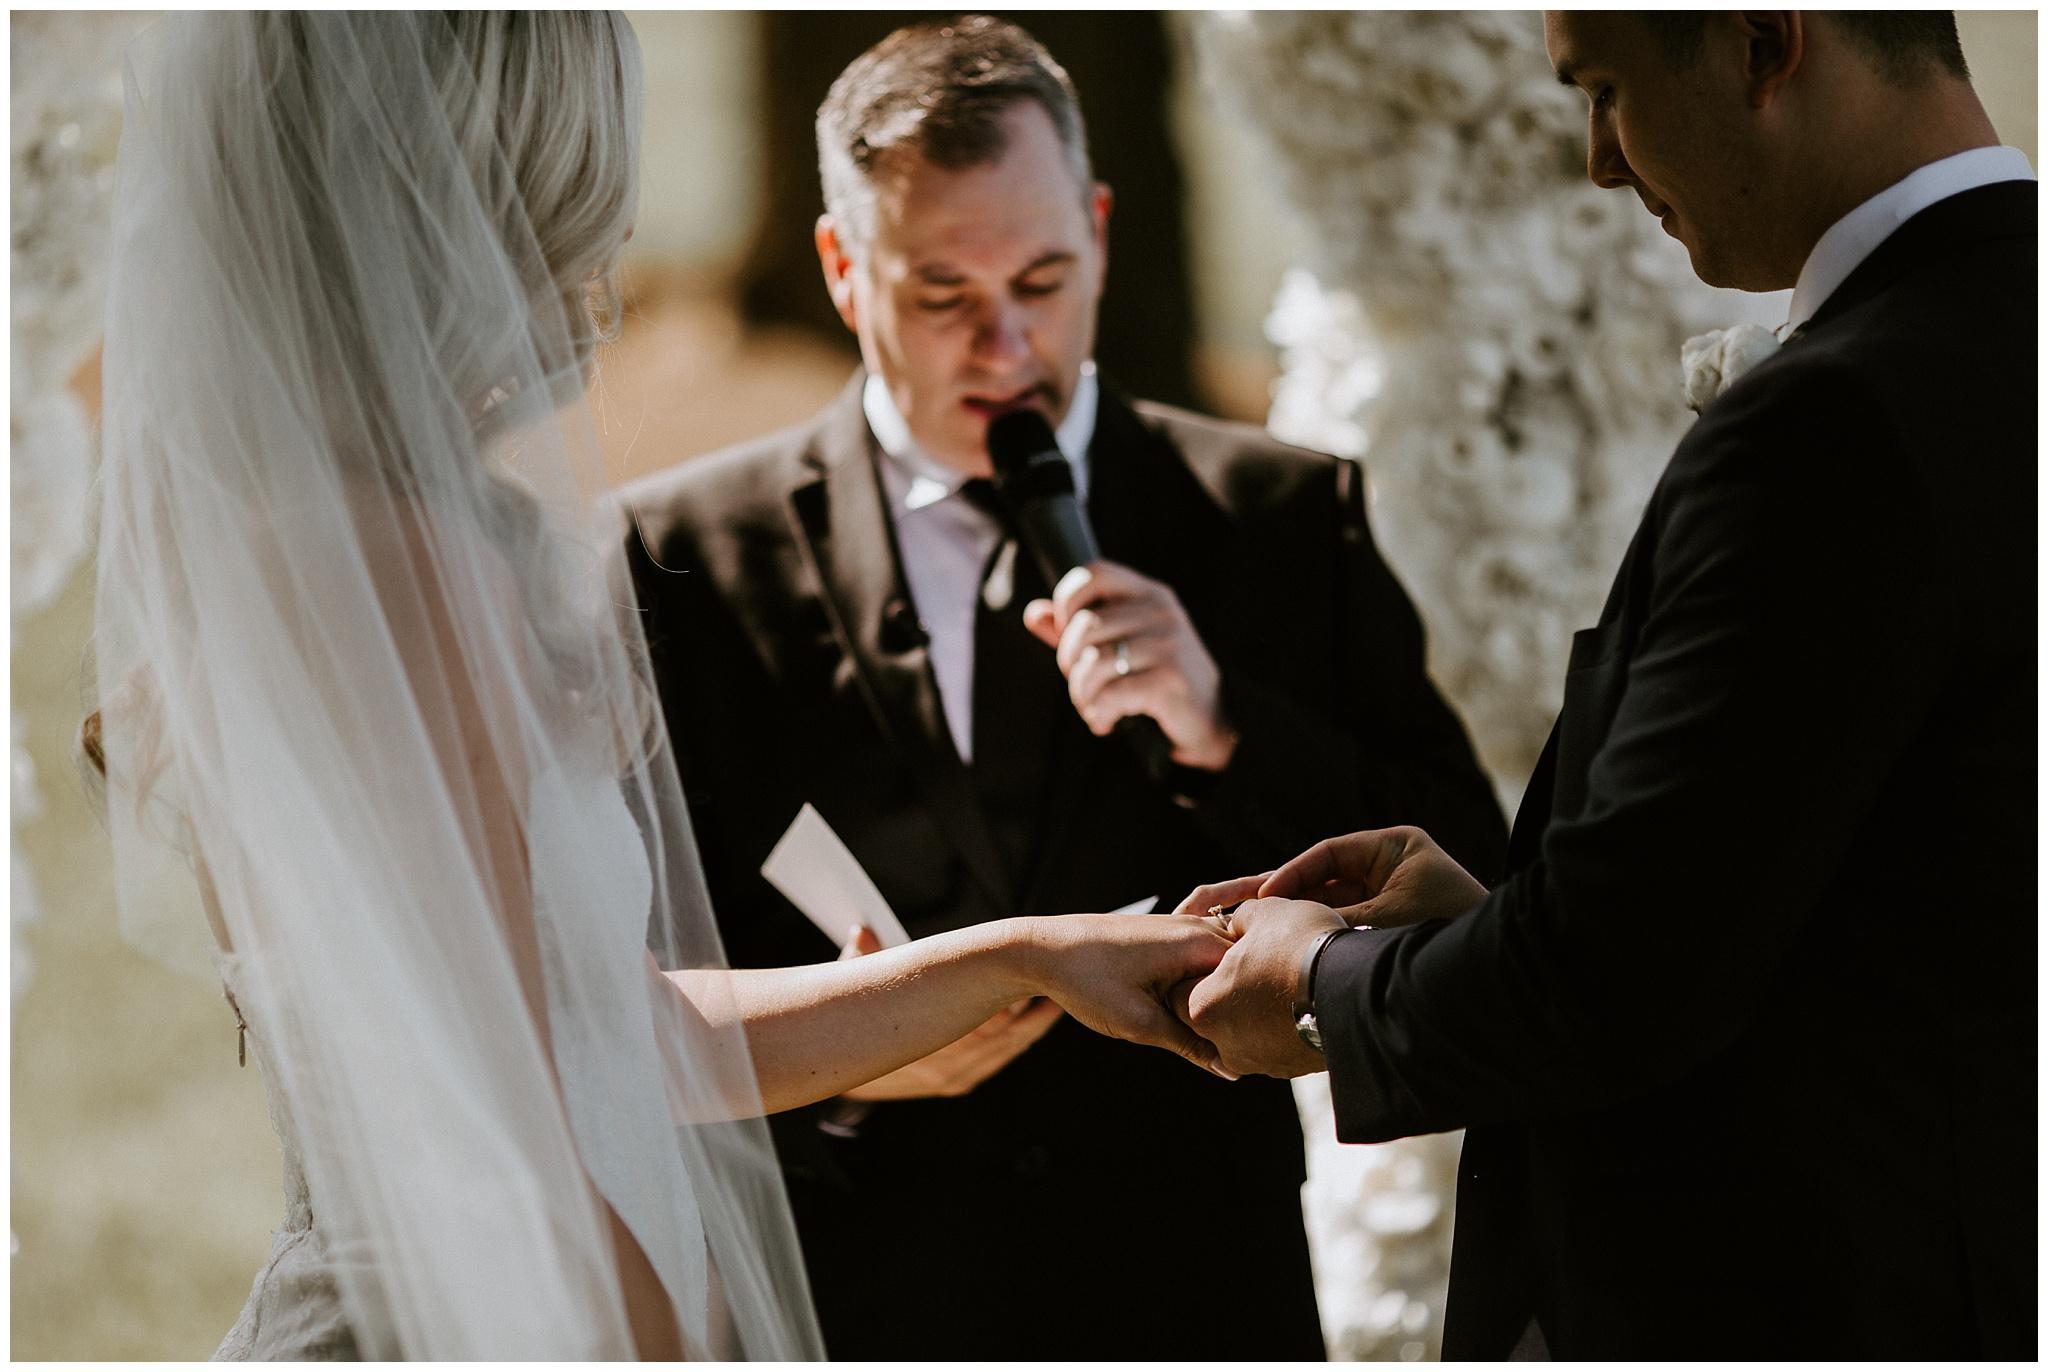 mt-lehman-winery-wedding-abbotsford-03.JPG